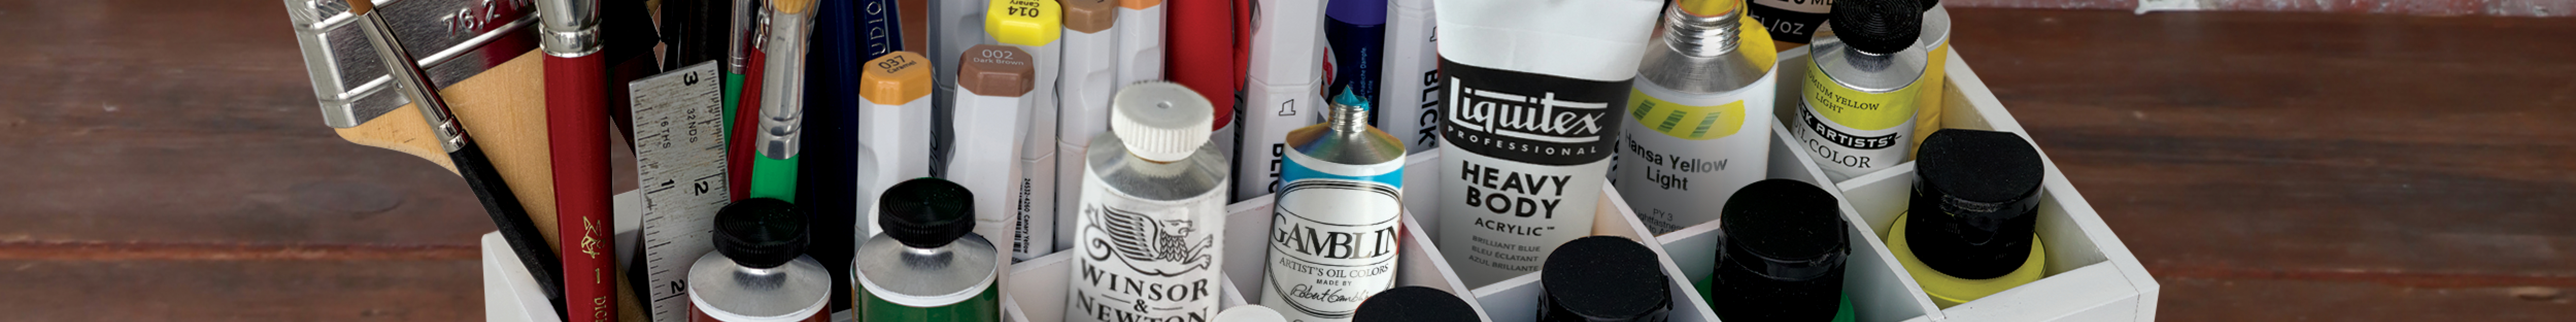 Art Storage and Organization | BLICK Art Materials